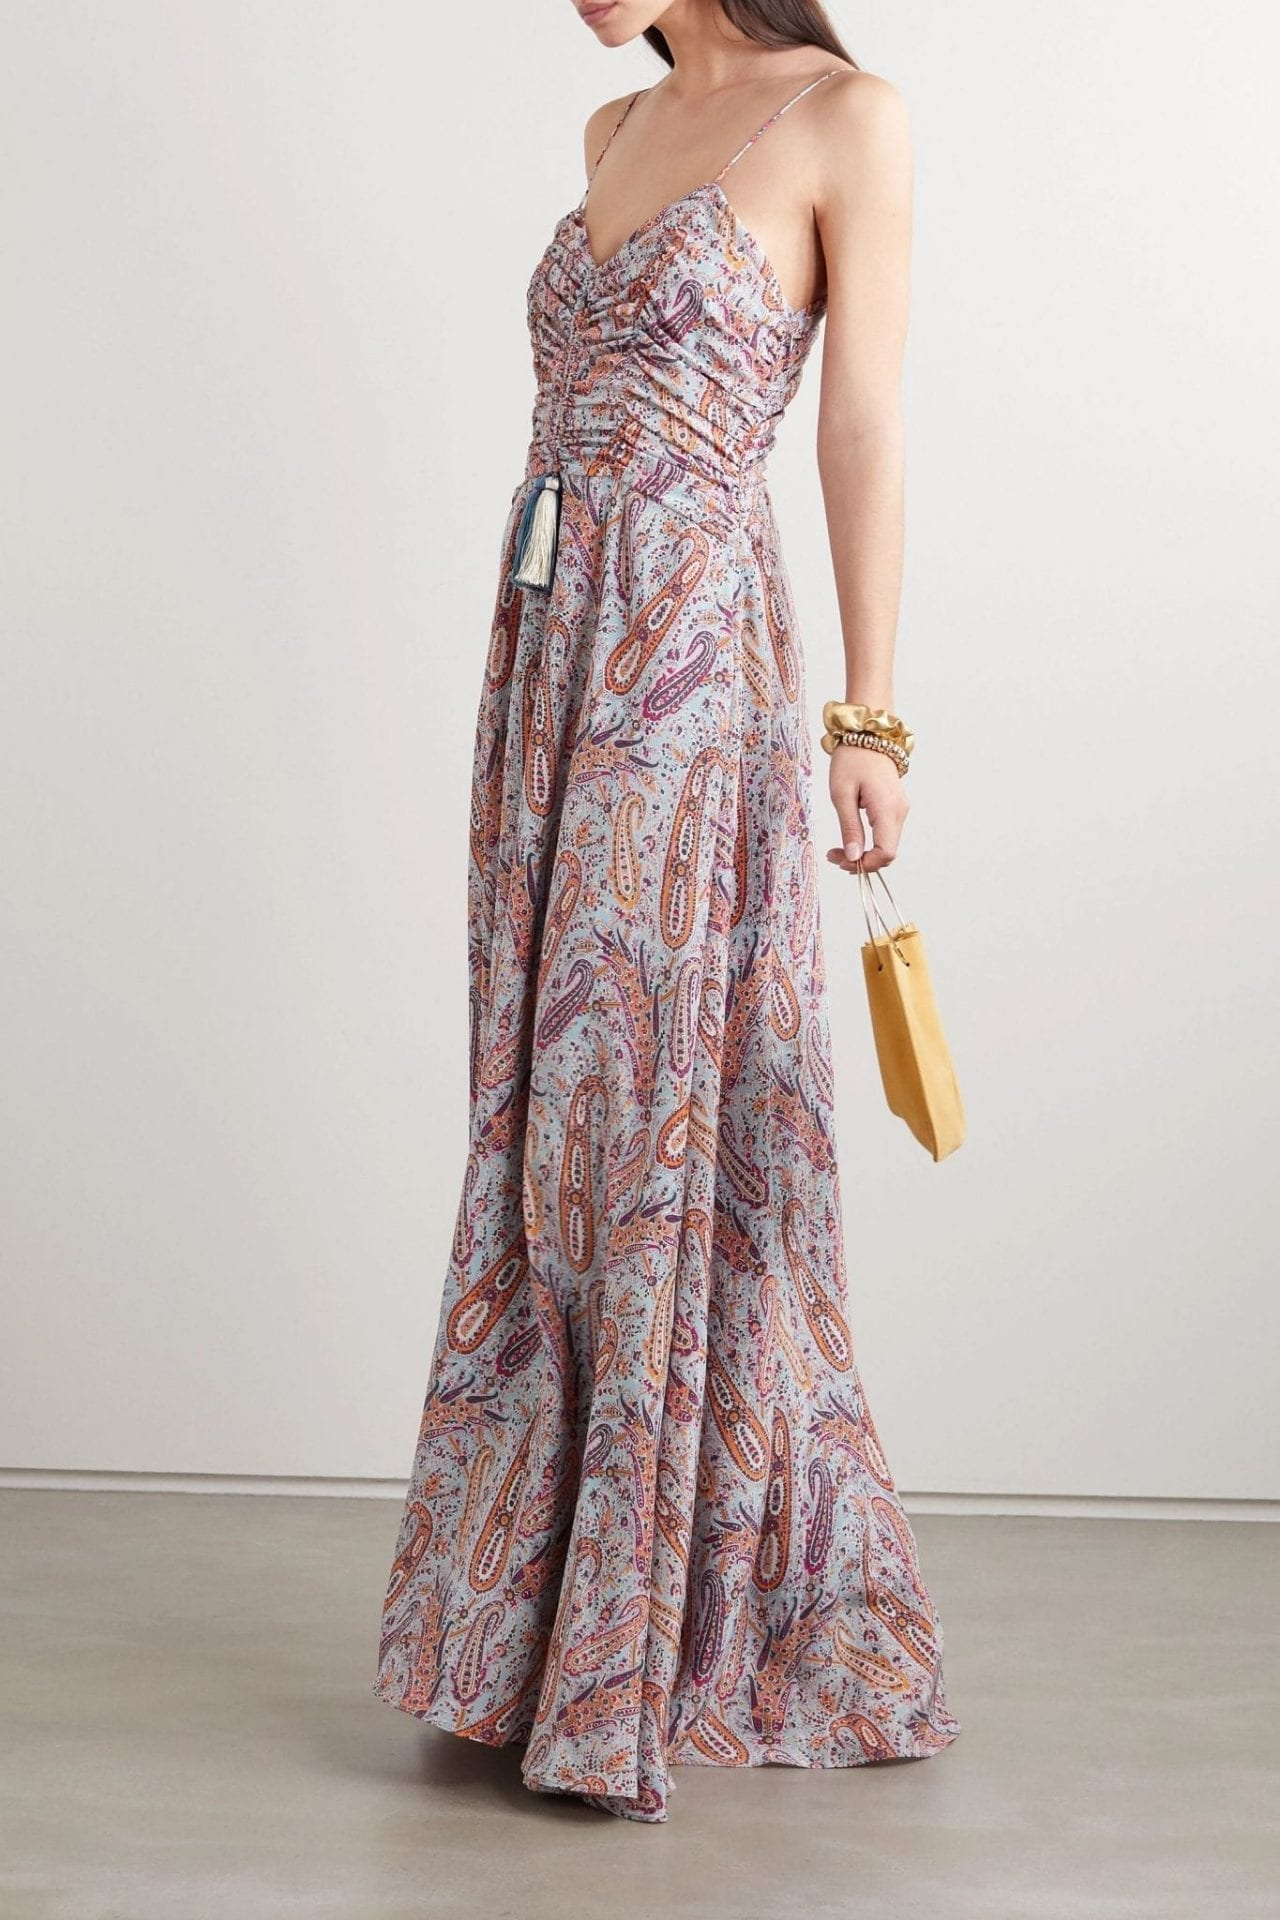 ETRO Tasseled Paisley-print Silk Crepe De Chine Maxi Dress